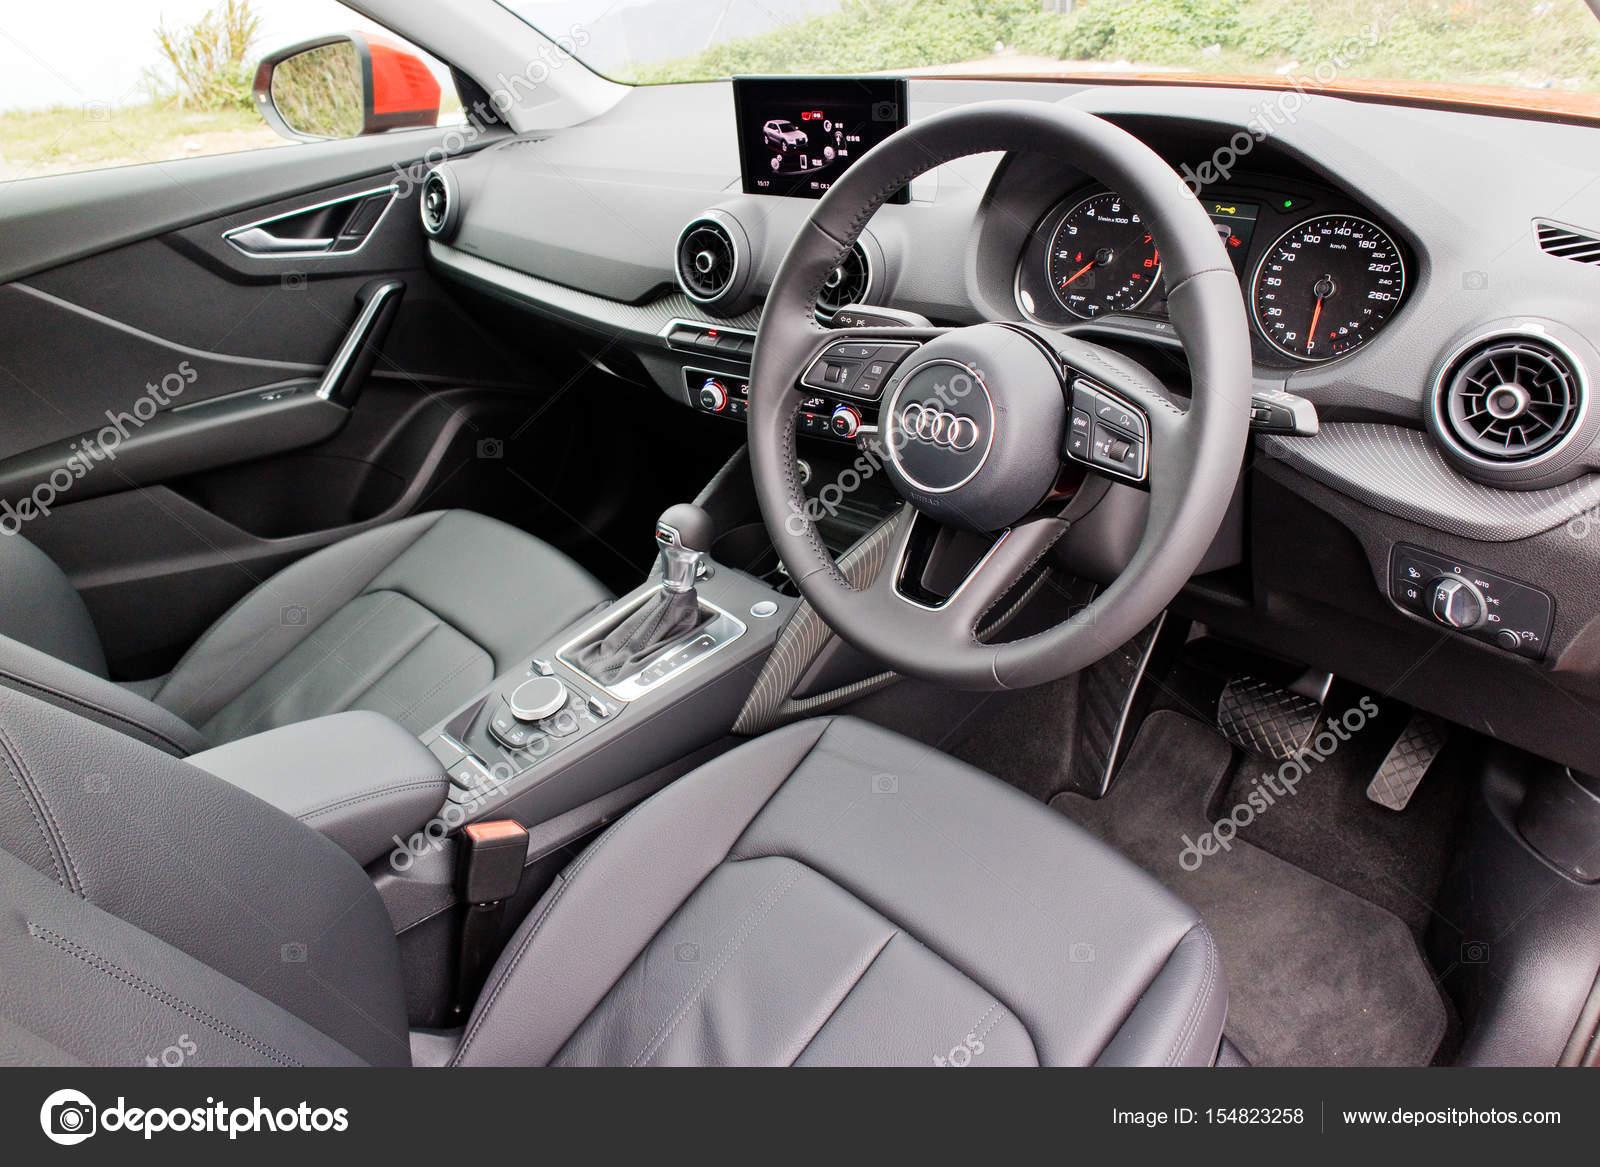 Audi Q2 2017 Interieur — Redaktionelles Stockfoto © teddyleung ...